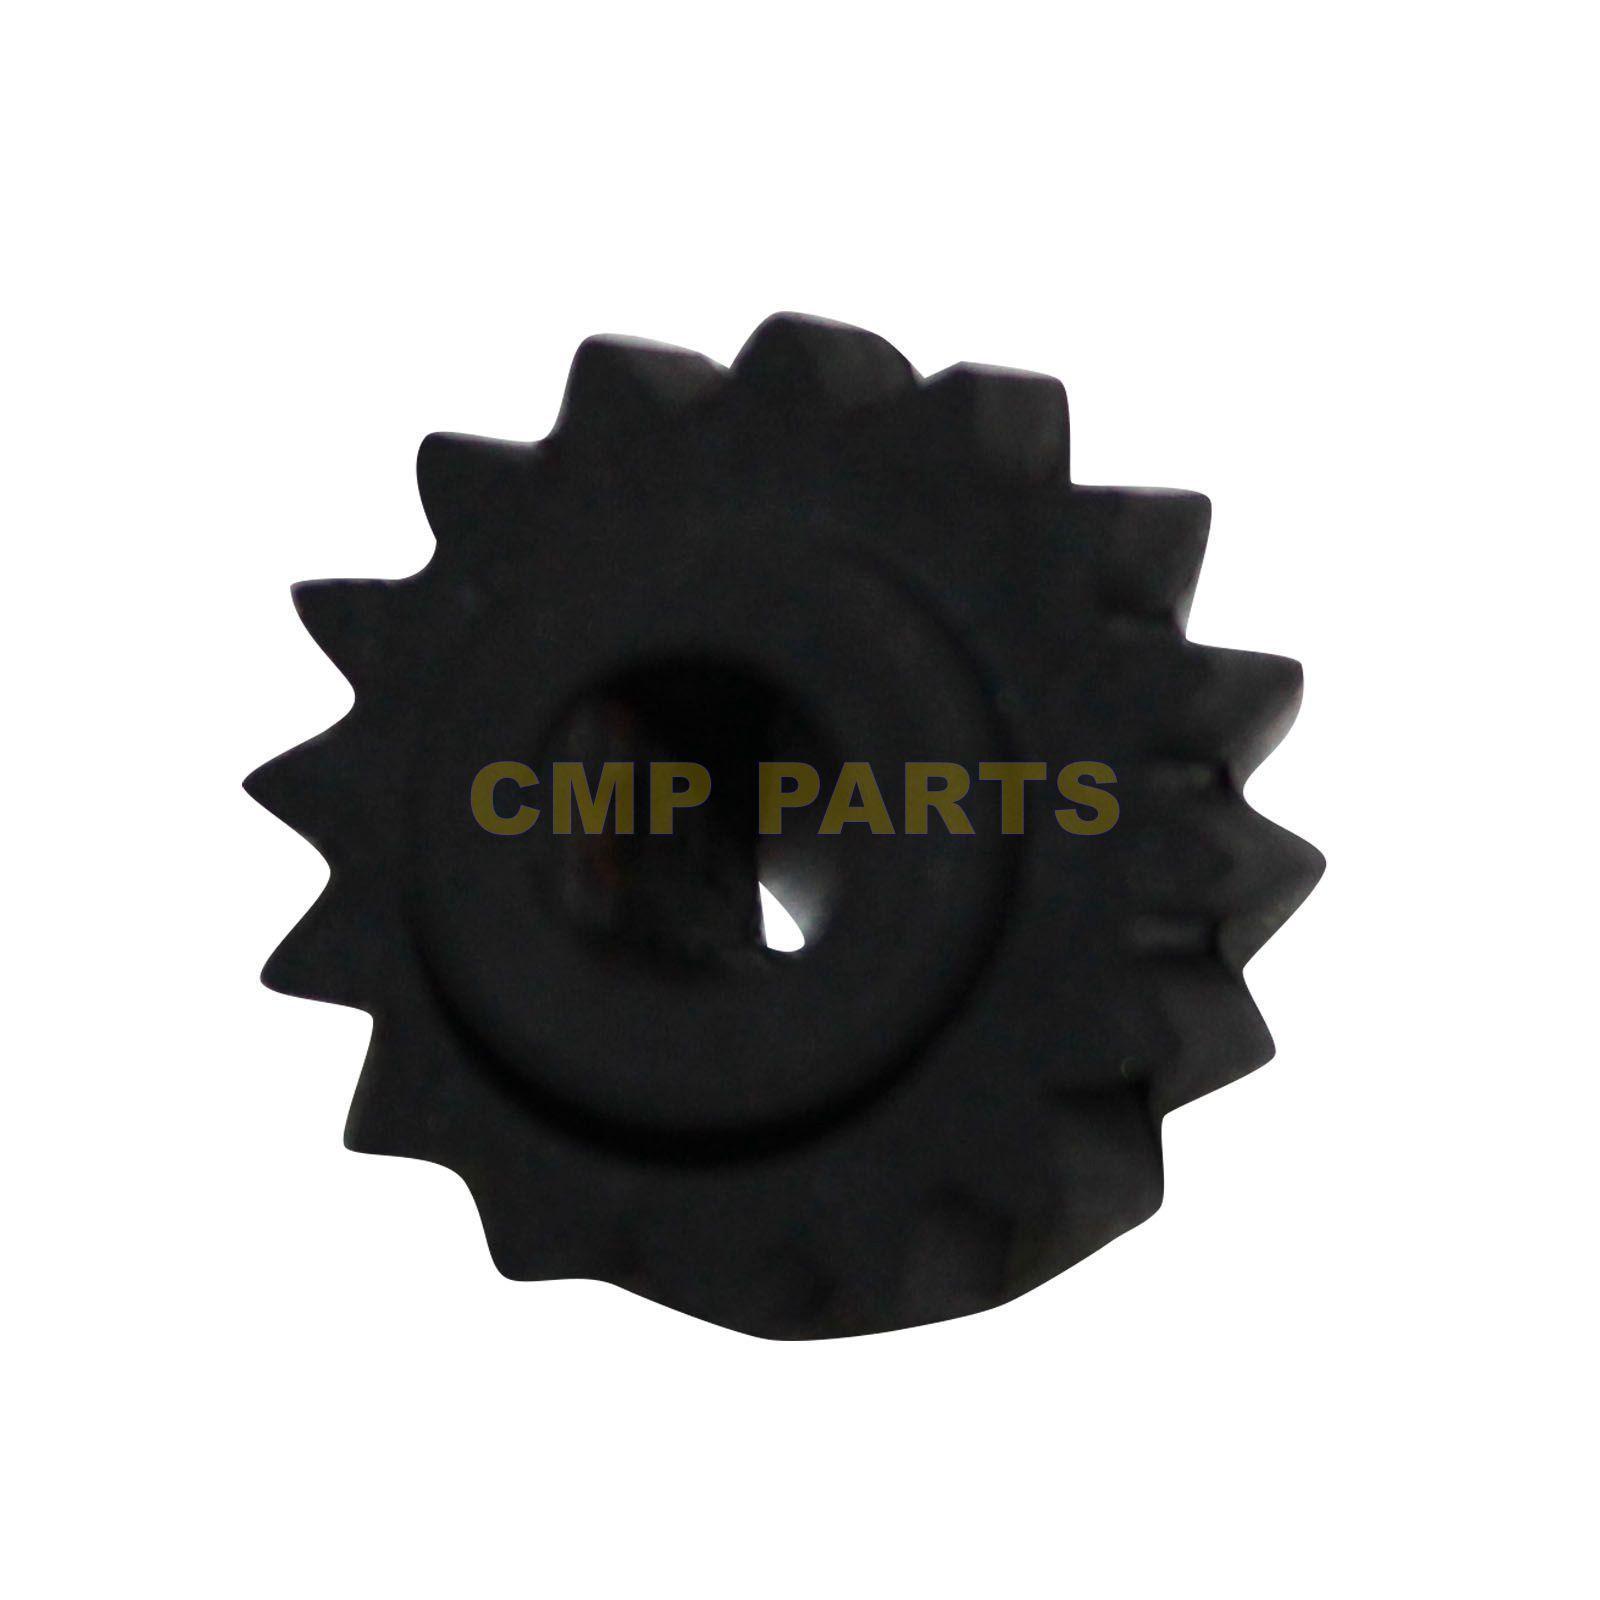 5PCS EX120-3 EX200-3 EX220-3 Motor Rubber Gear Starter Gear for Hitachi